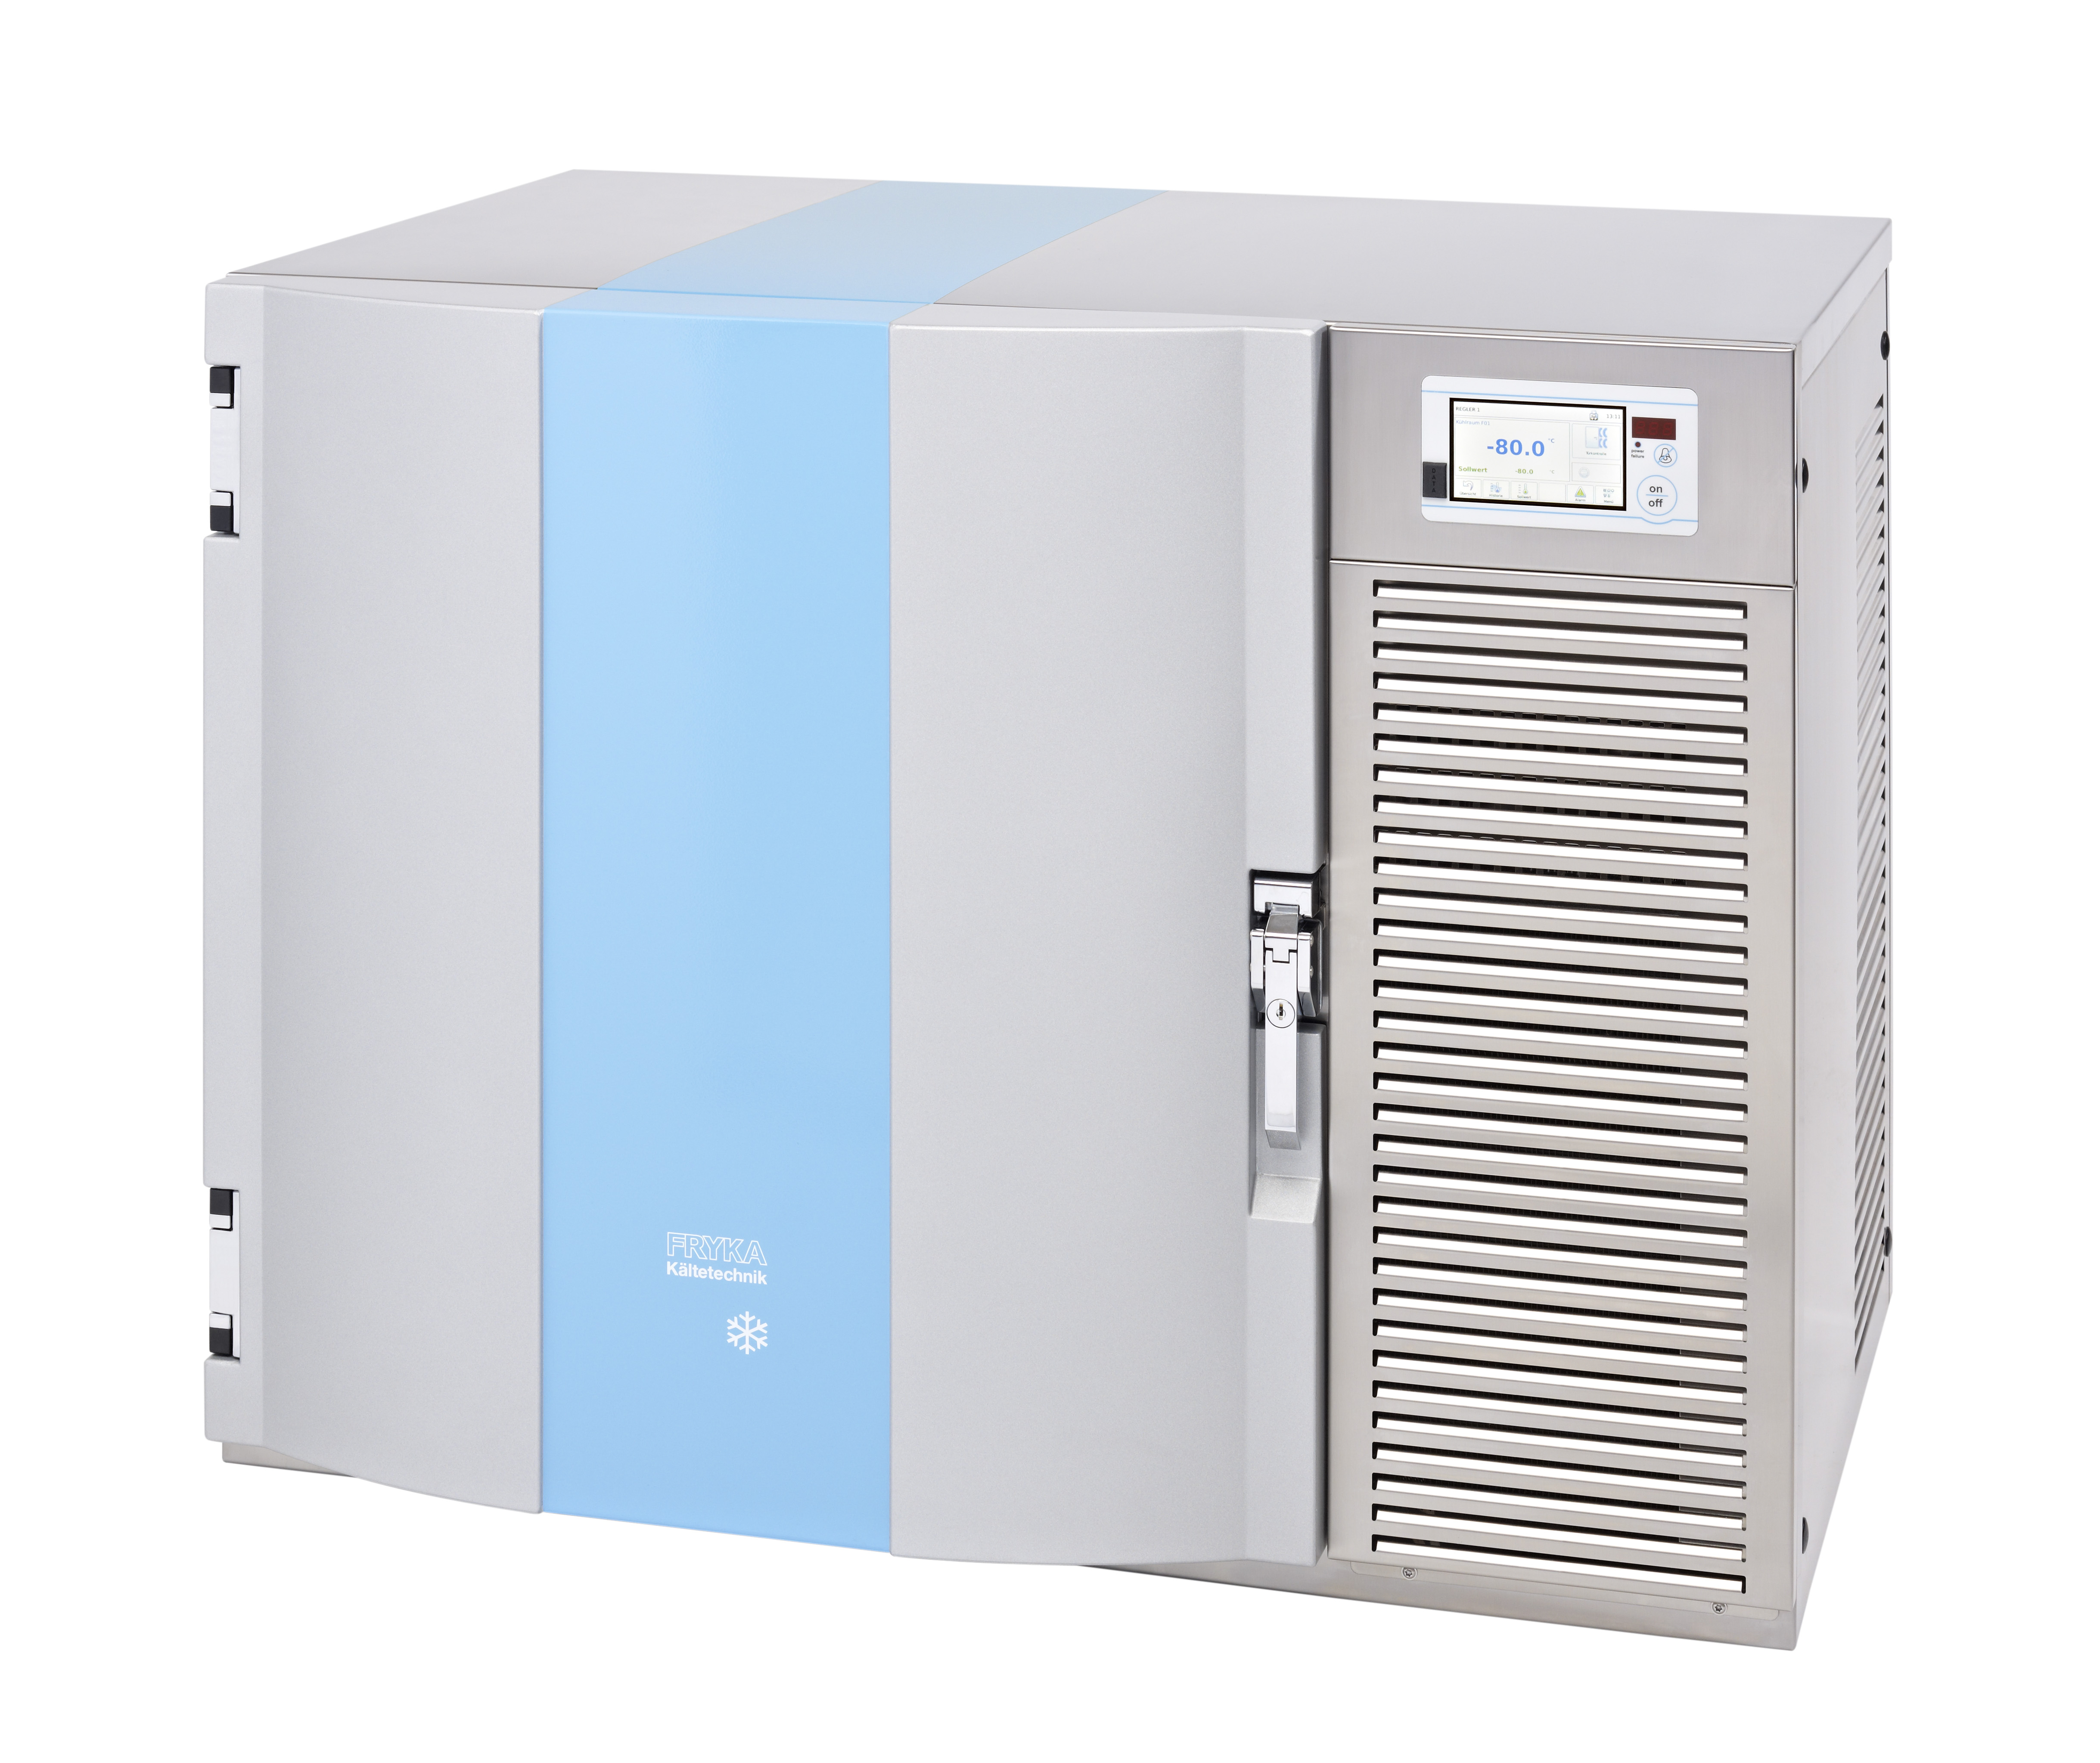 FRYKA Tiefkühlbox TUS 80-100 logg (-50°C bis -80°C)